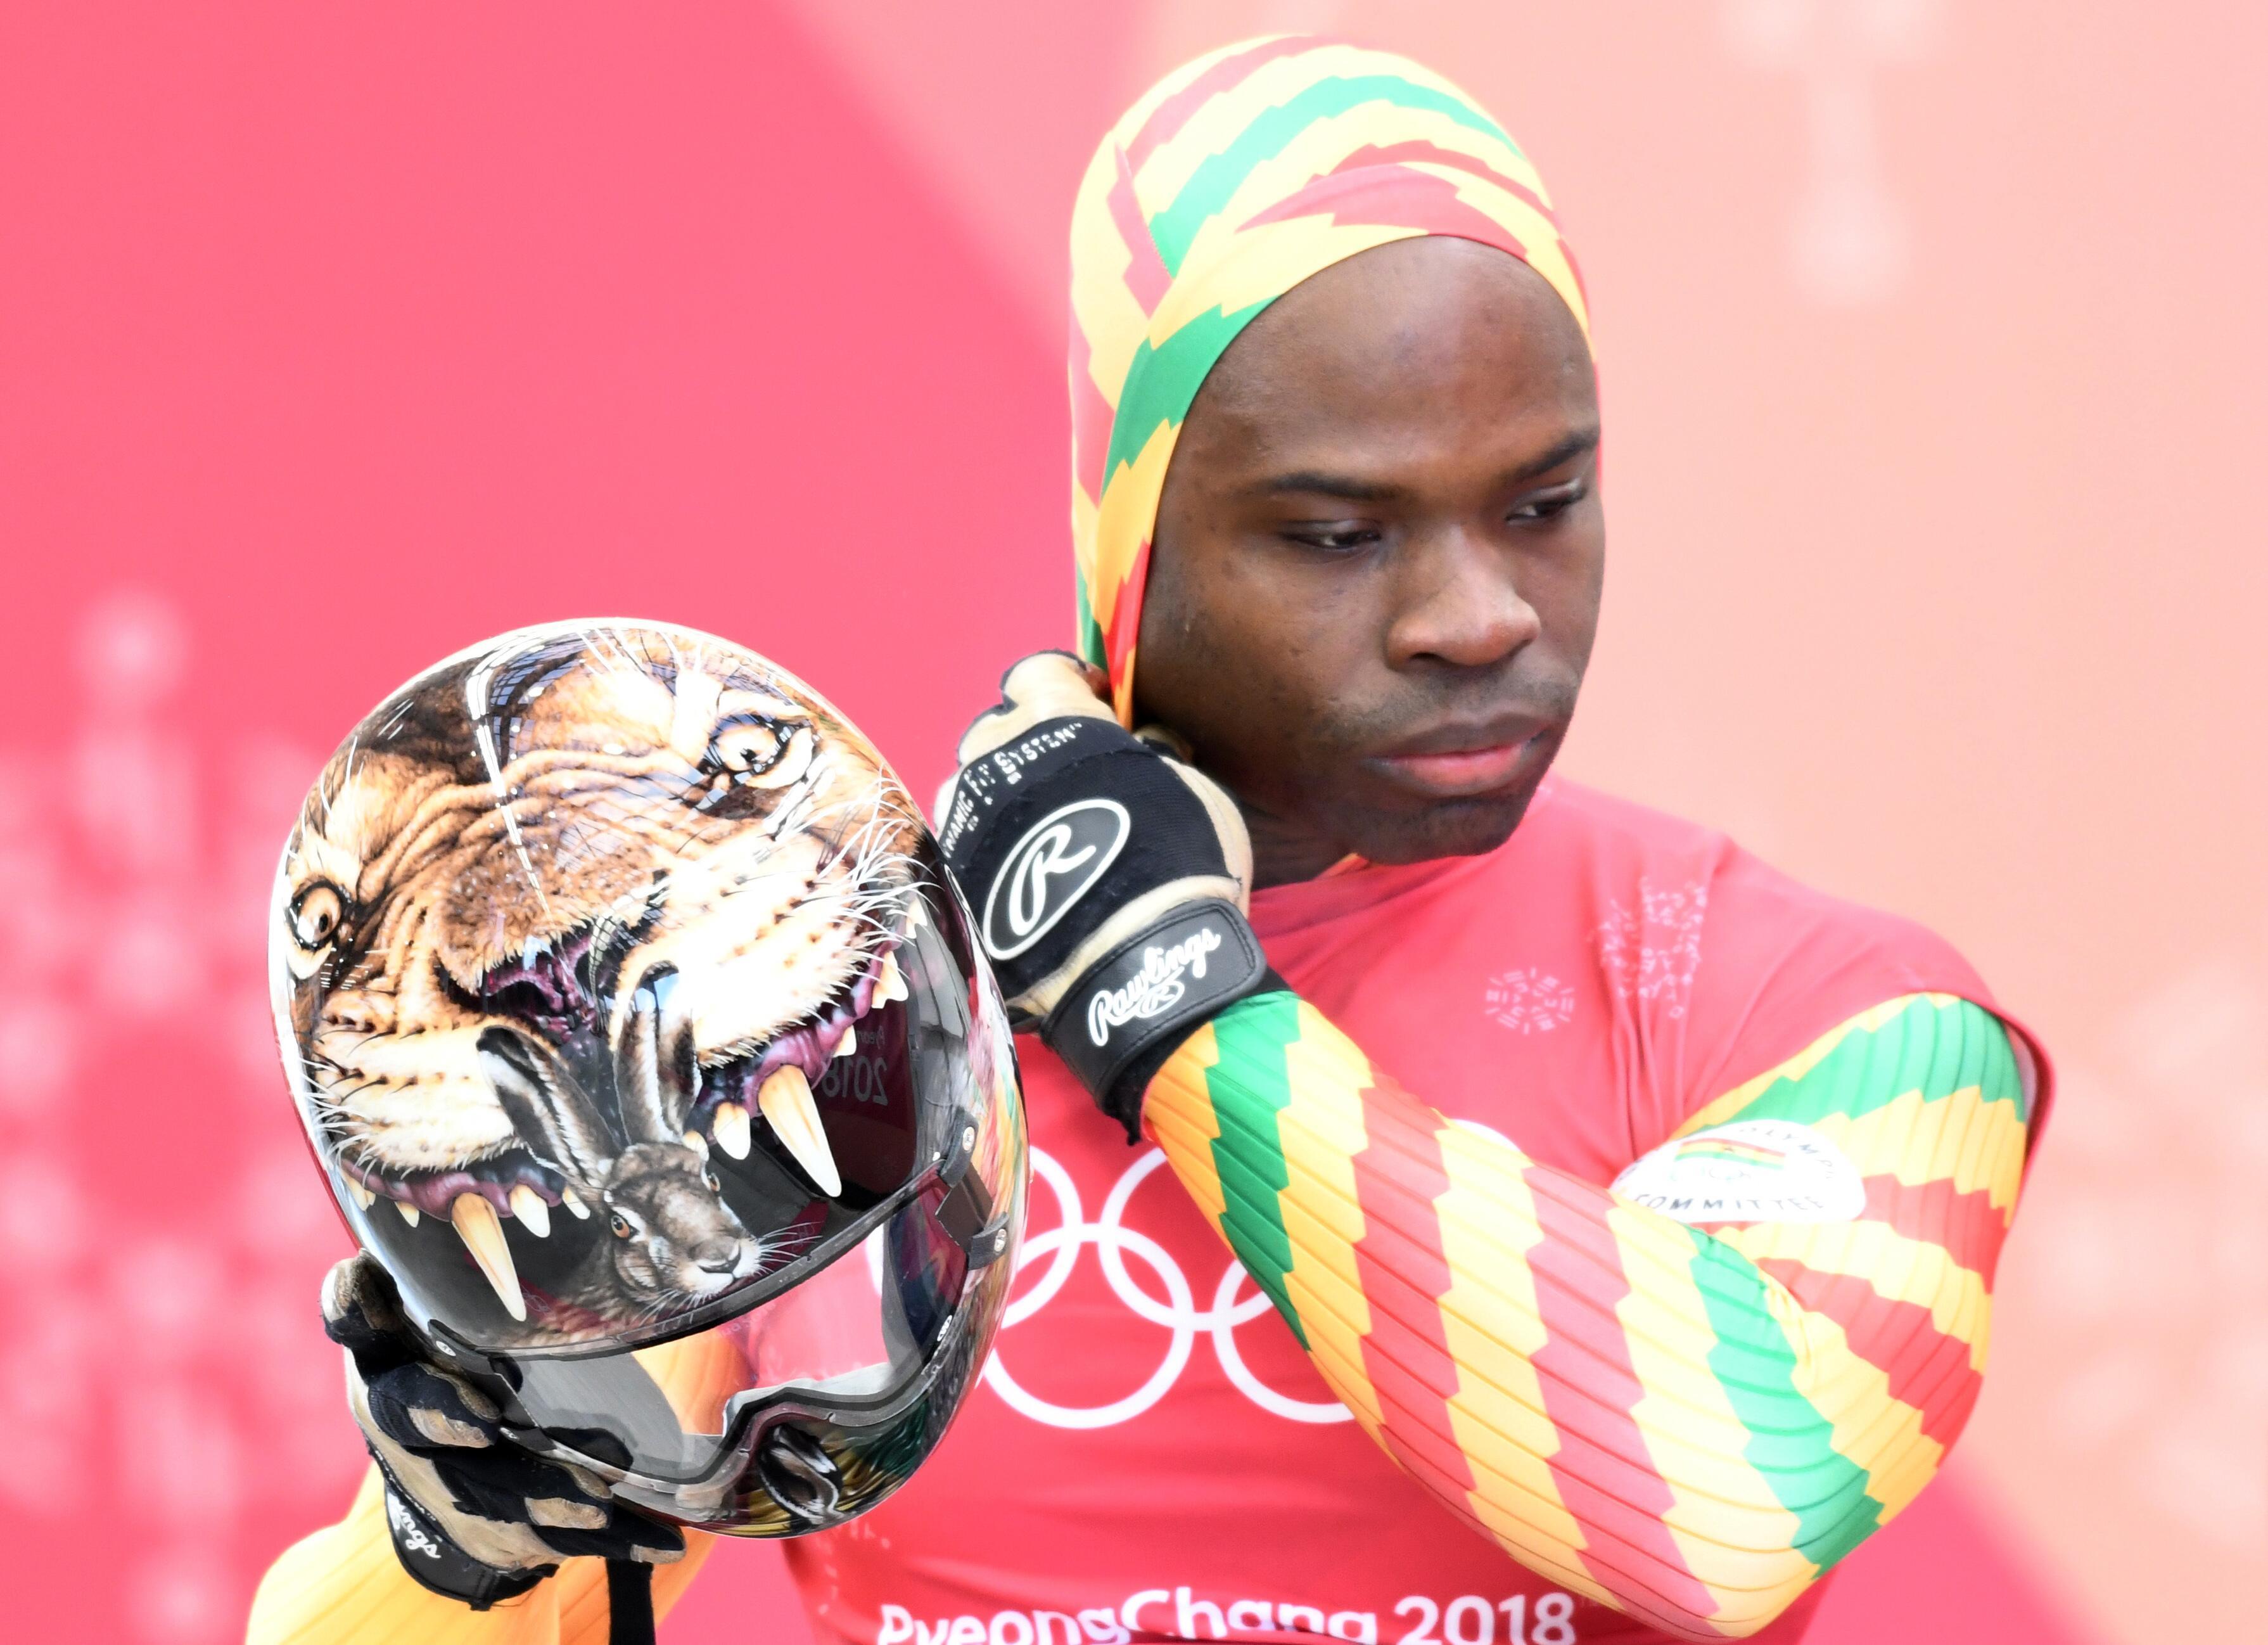 Bild zu Olympia, olympische Spiele, Pyeongchang, Gold-Medaille